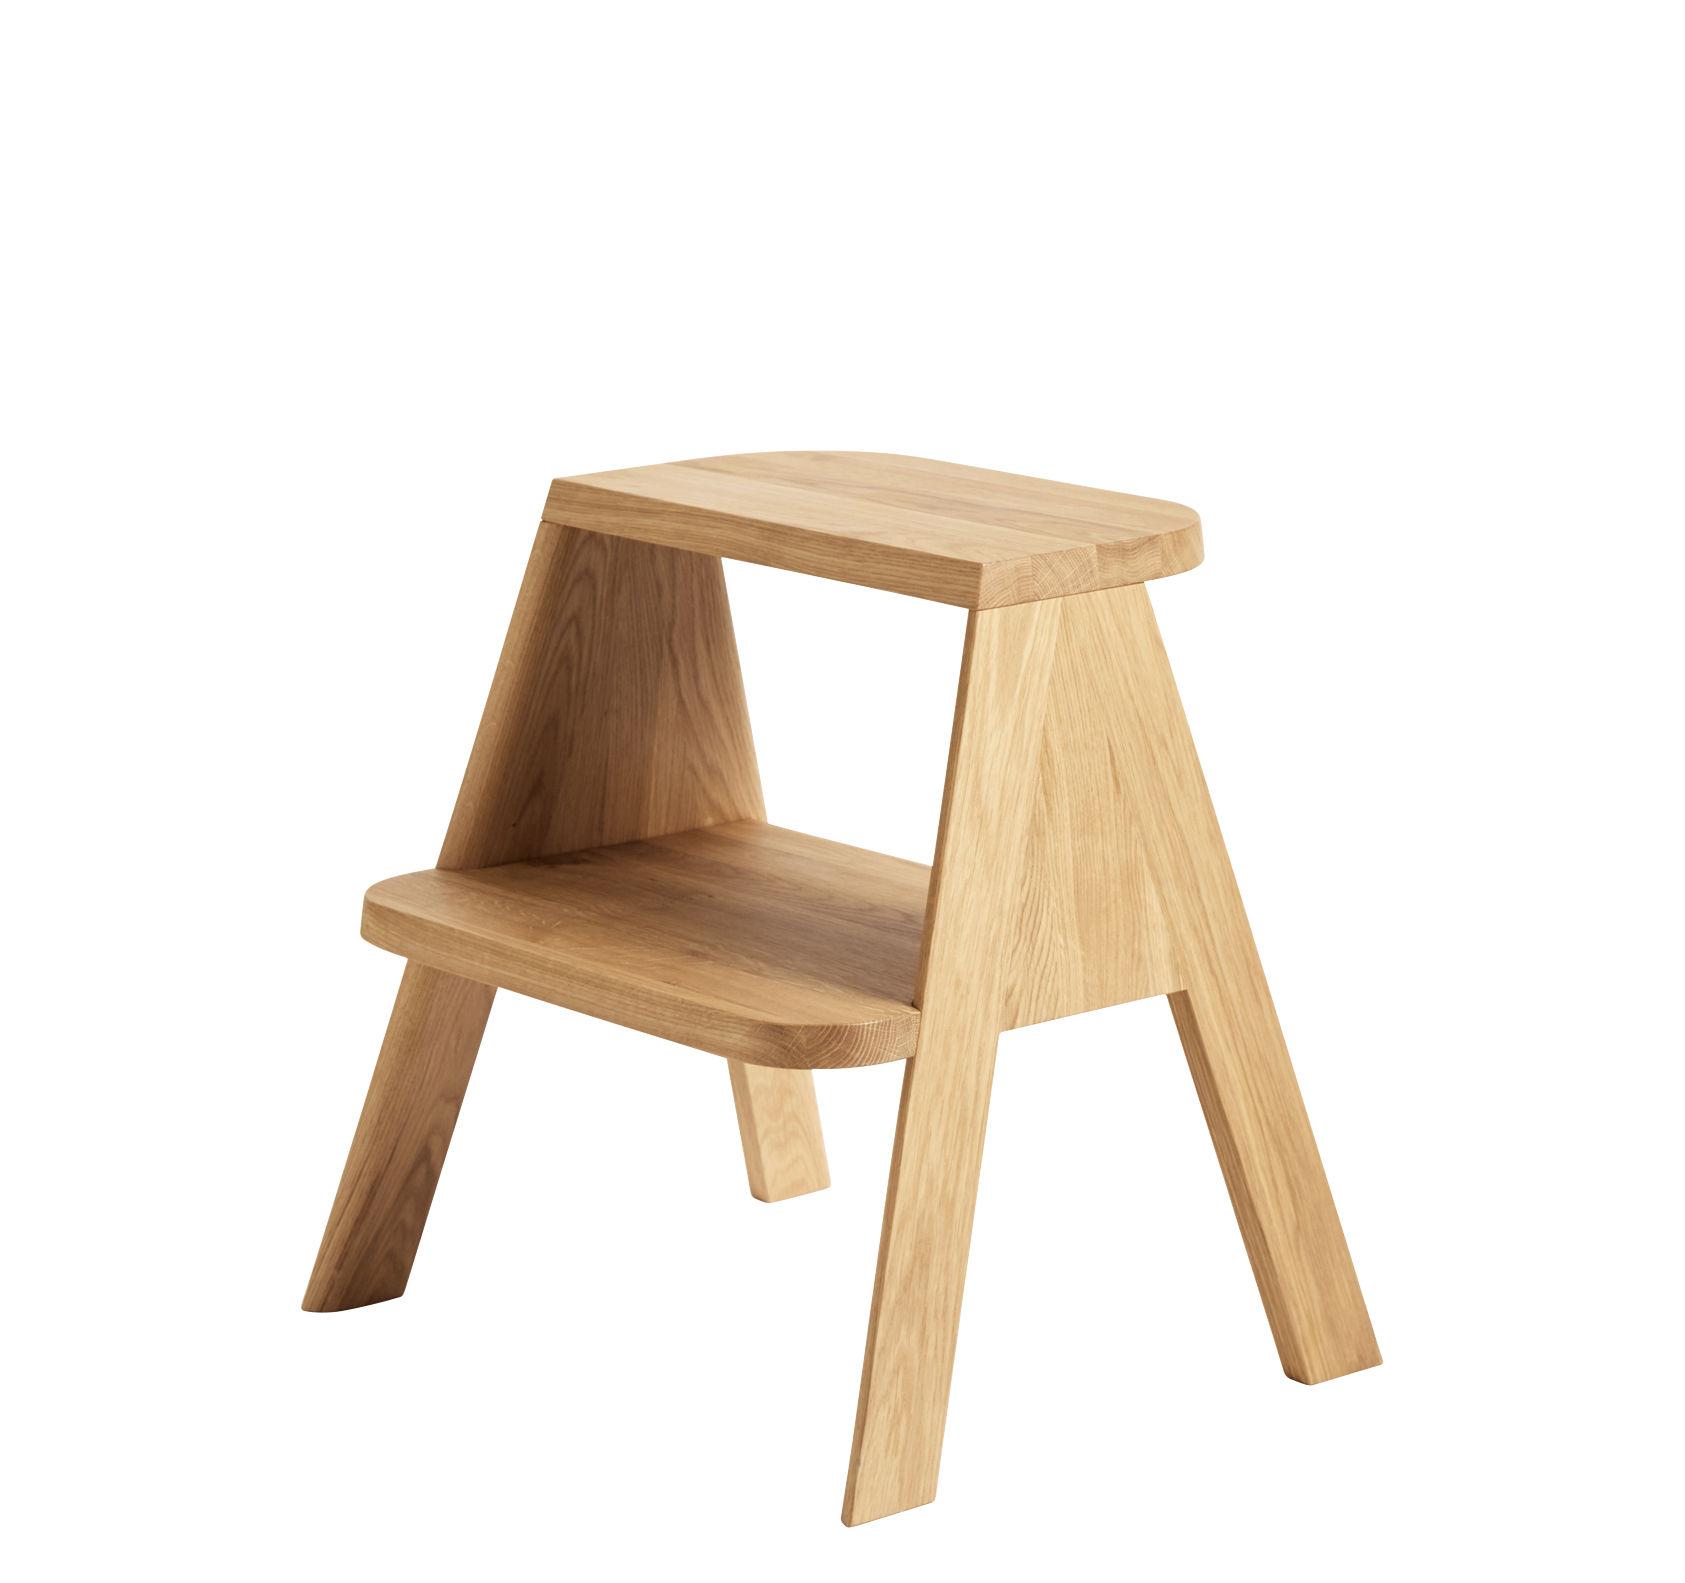 Furniture - Miscellaneous furniture - Butler Stepladder - / Multifonction - Chêne by Hay - Chêne huilé - Solid oak